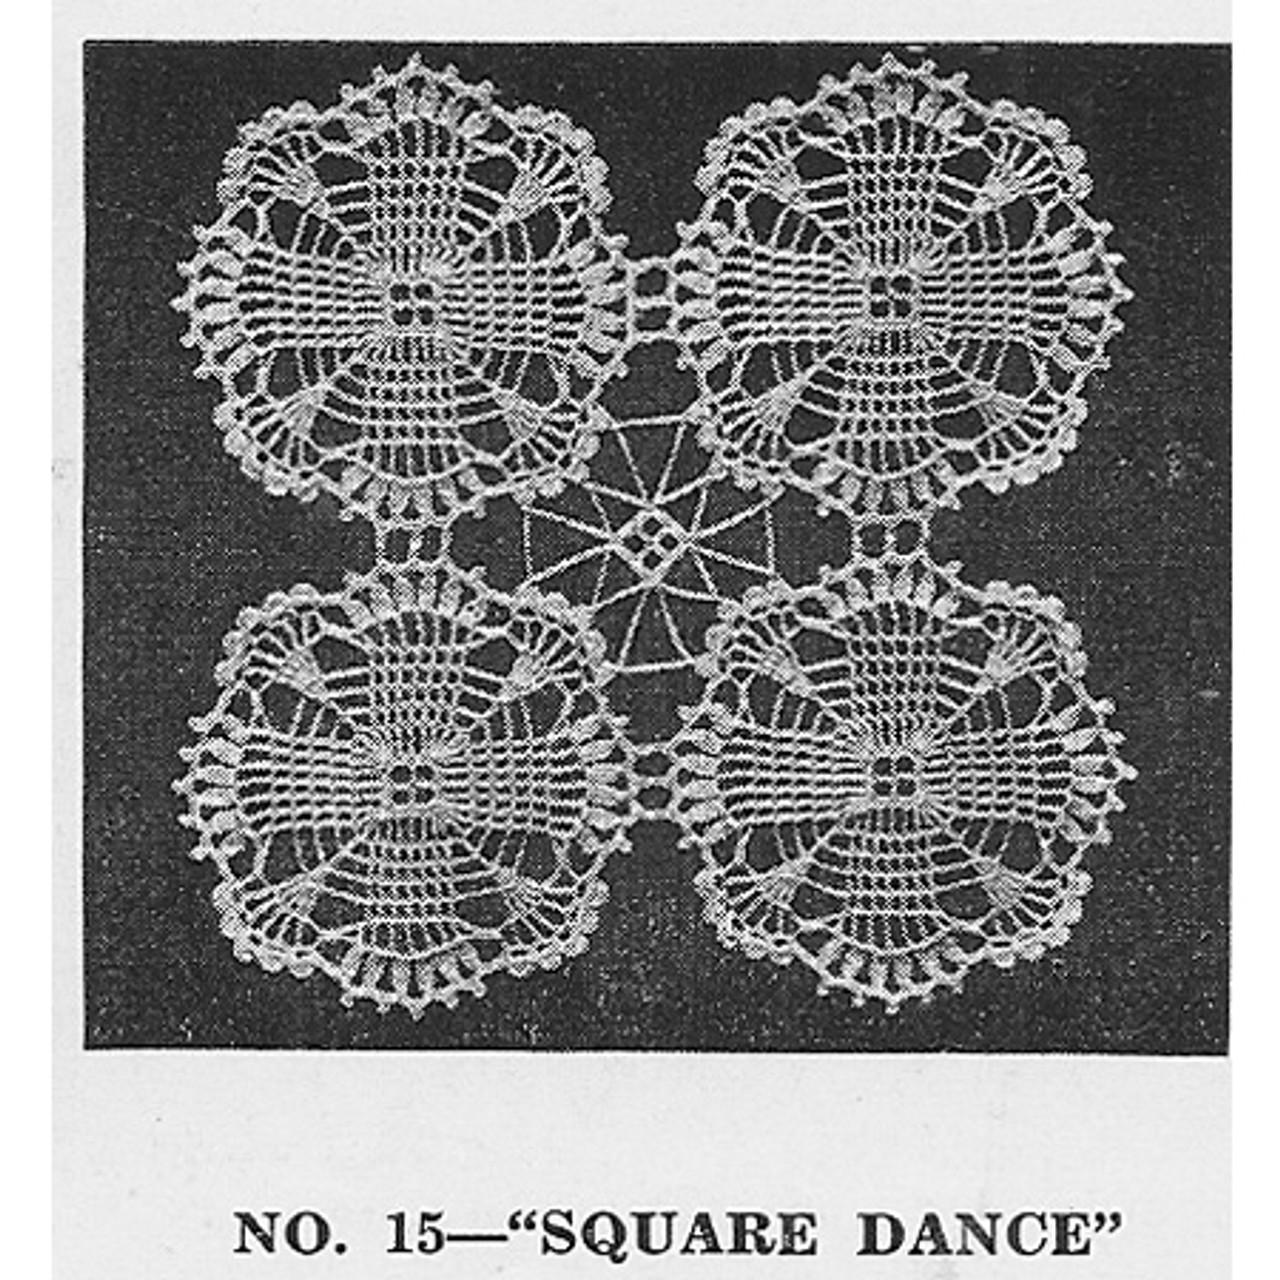 Vintage Square Dance Crochet Medallions Pattern Joined